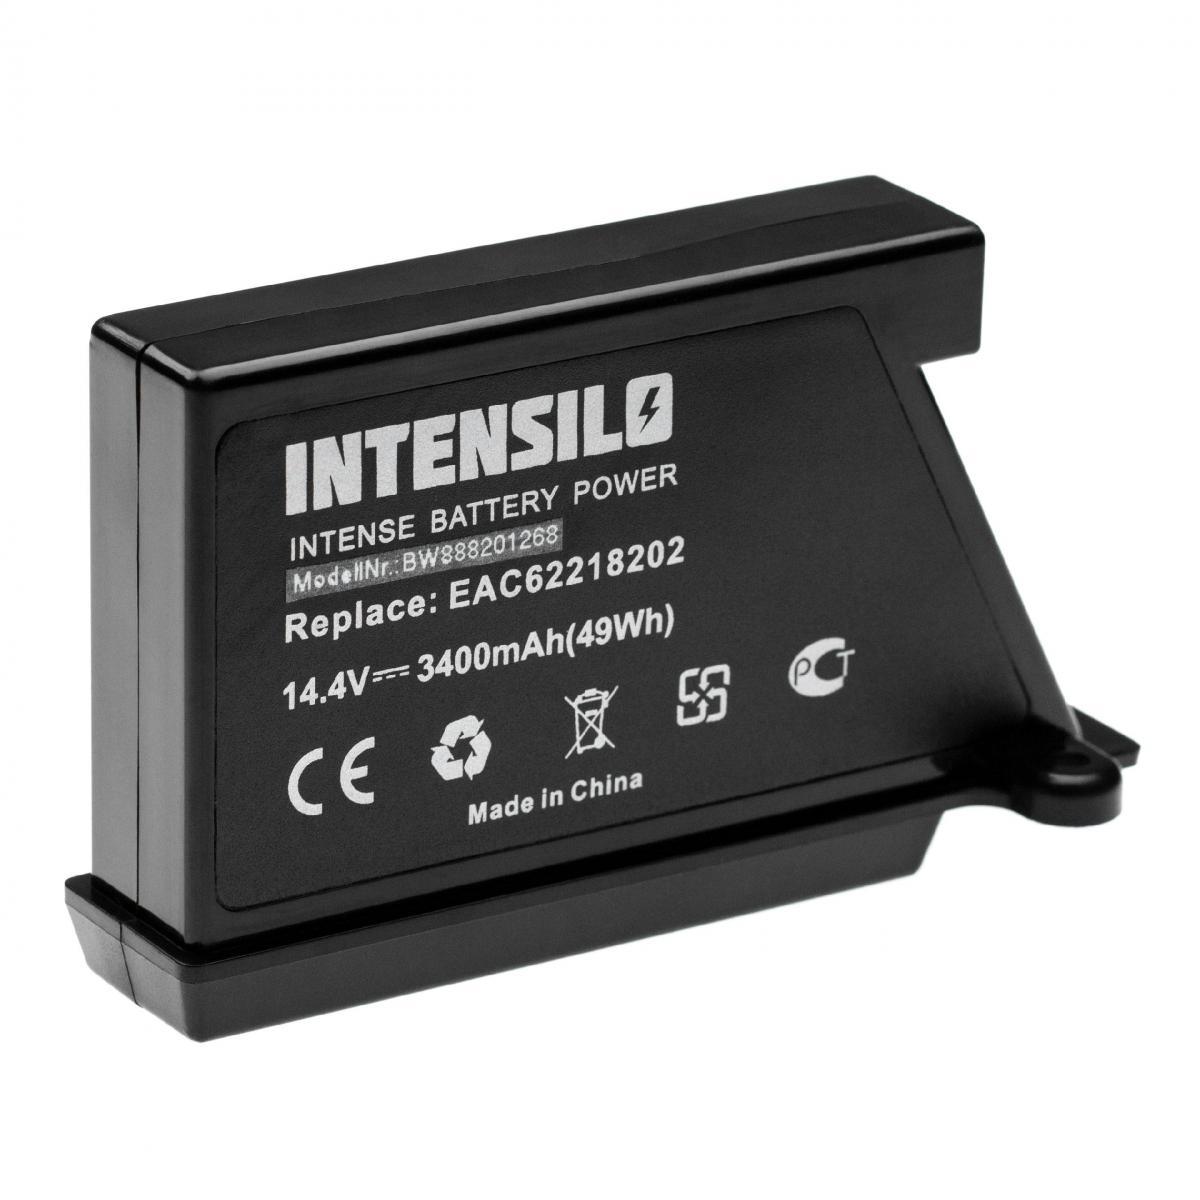 Vhbw INTENSILO Batterie compatible avec LG HOM-BOT VR9627PG, VR9647PS, VRD710RRC robot électroménager (3400mAh, 14,4V, Li-ion